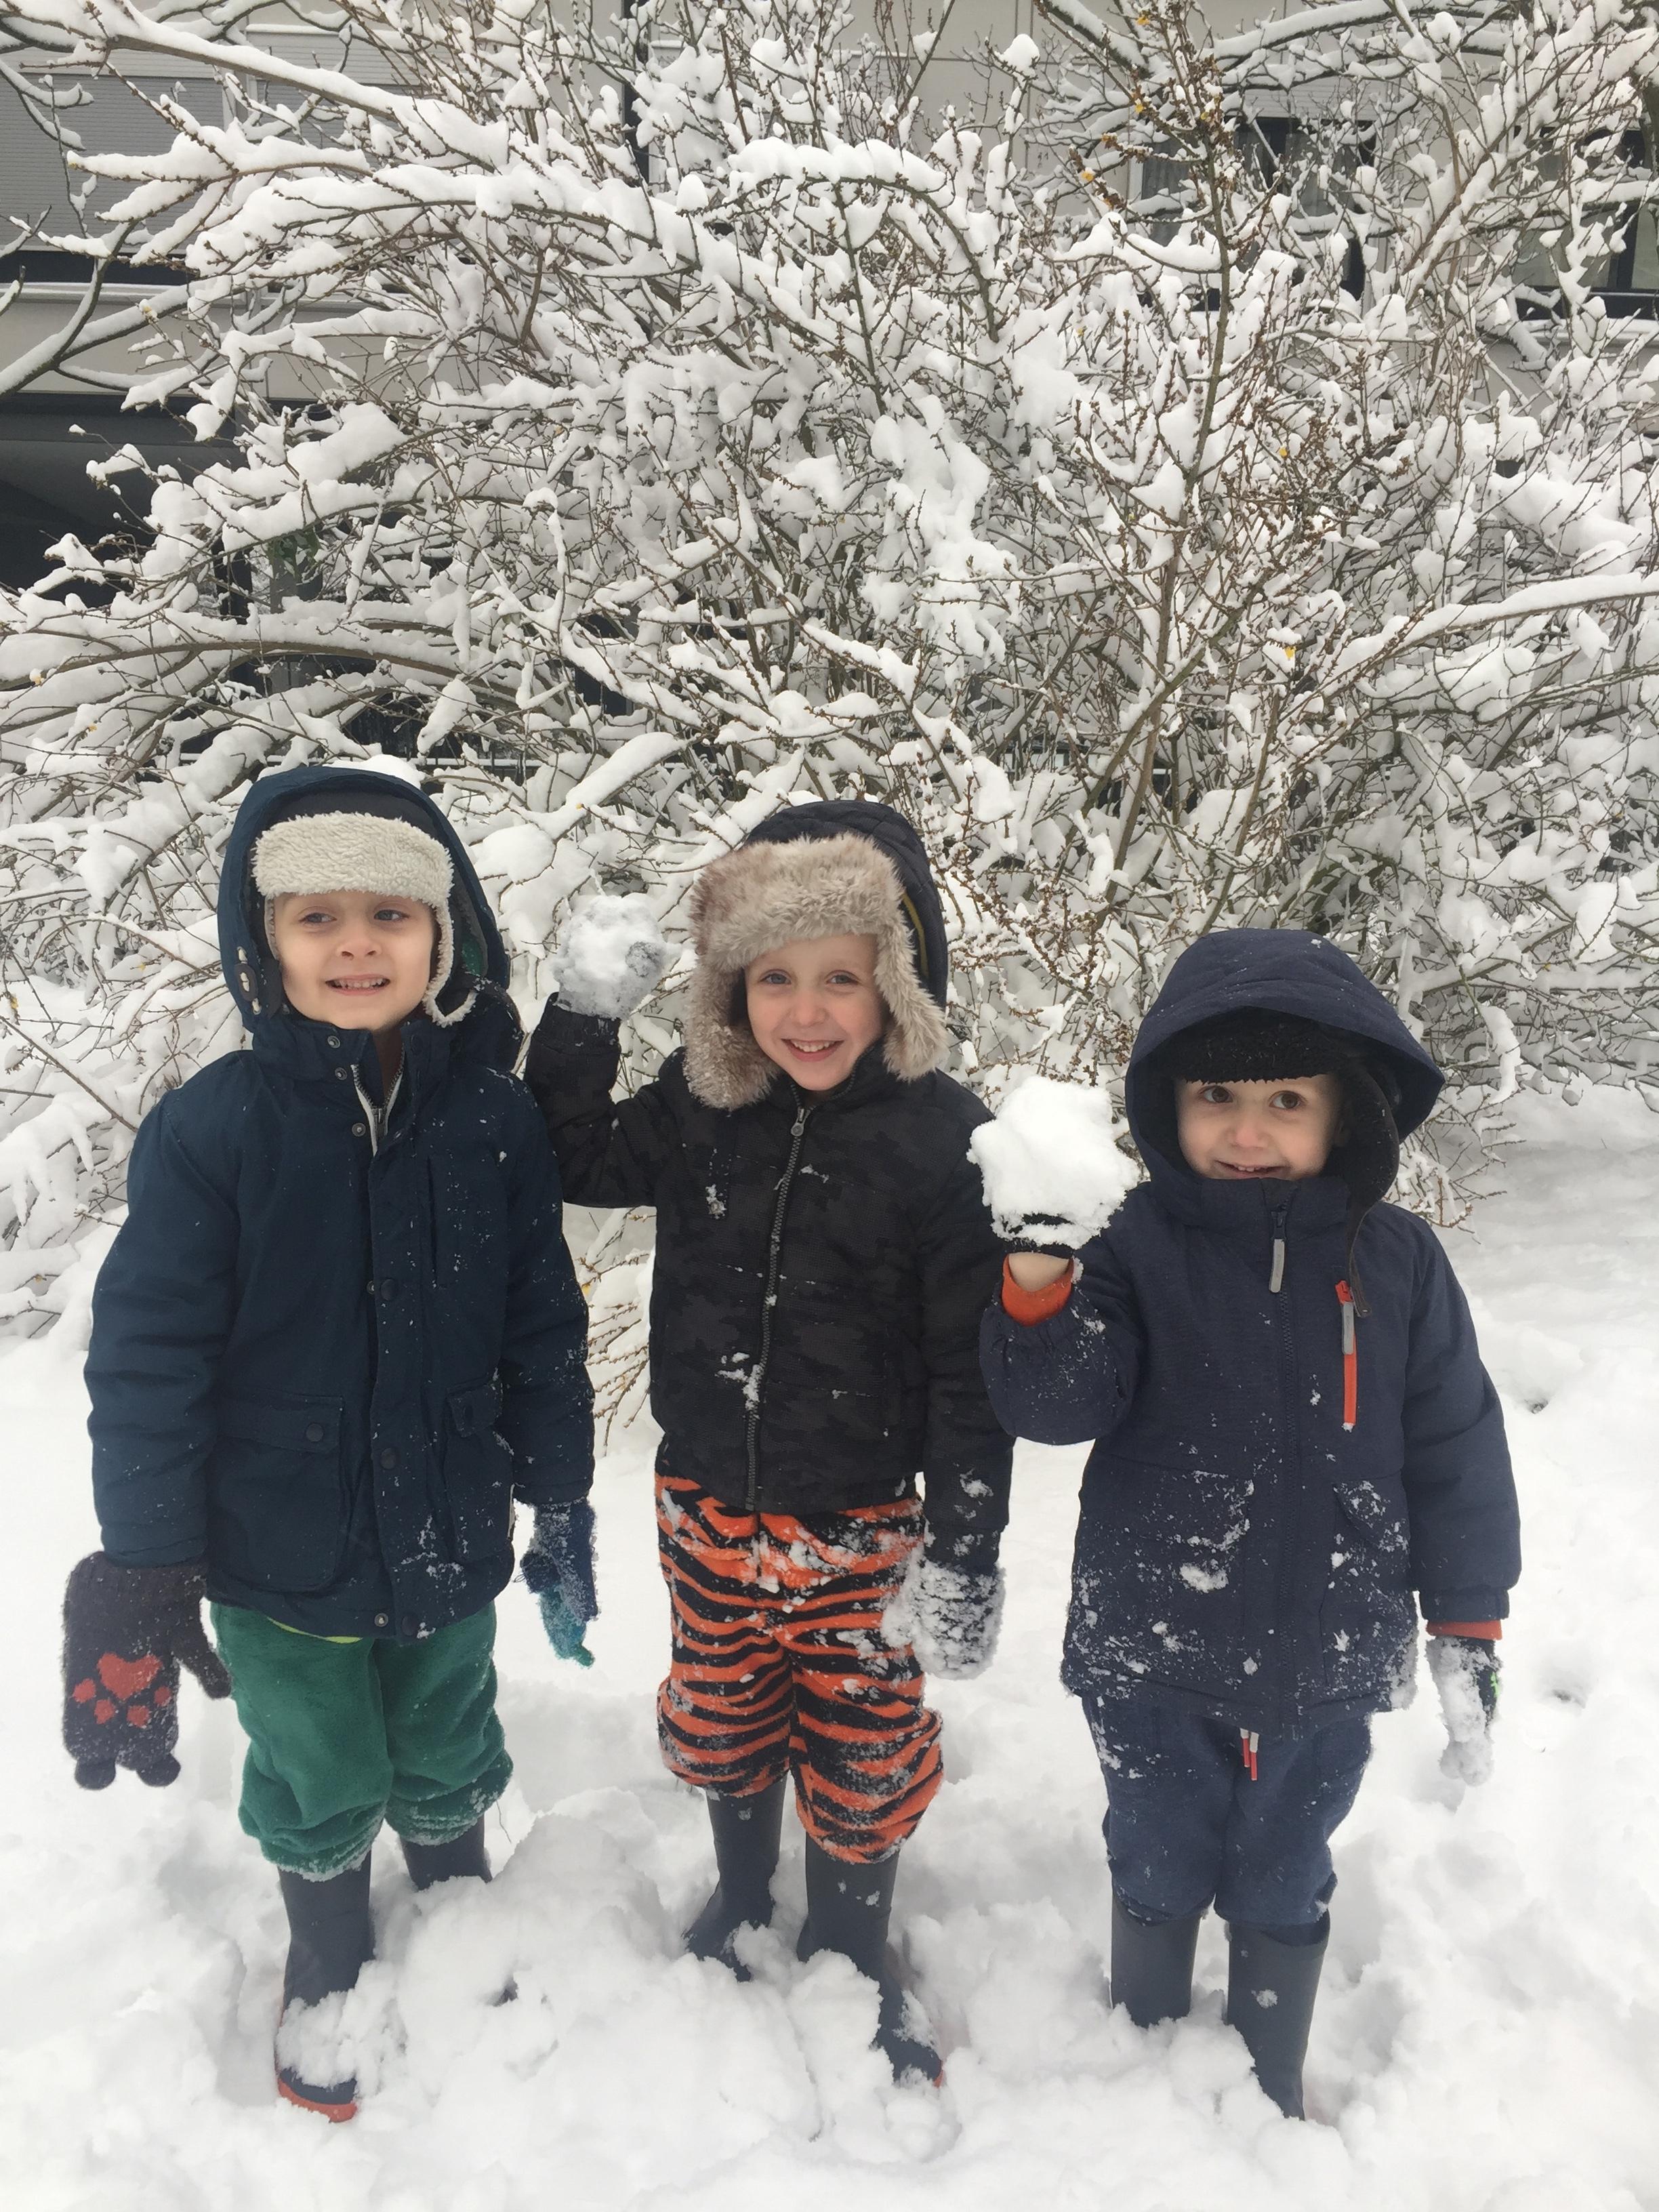 The Boys enjoying the snow!